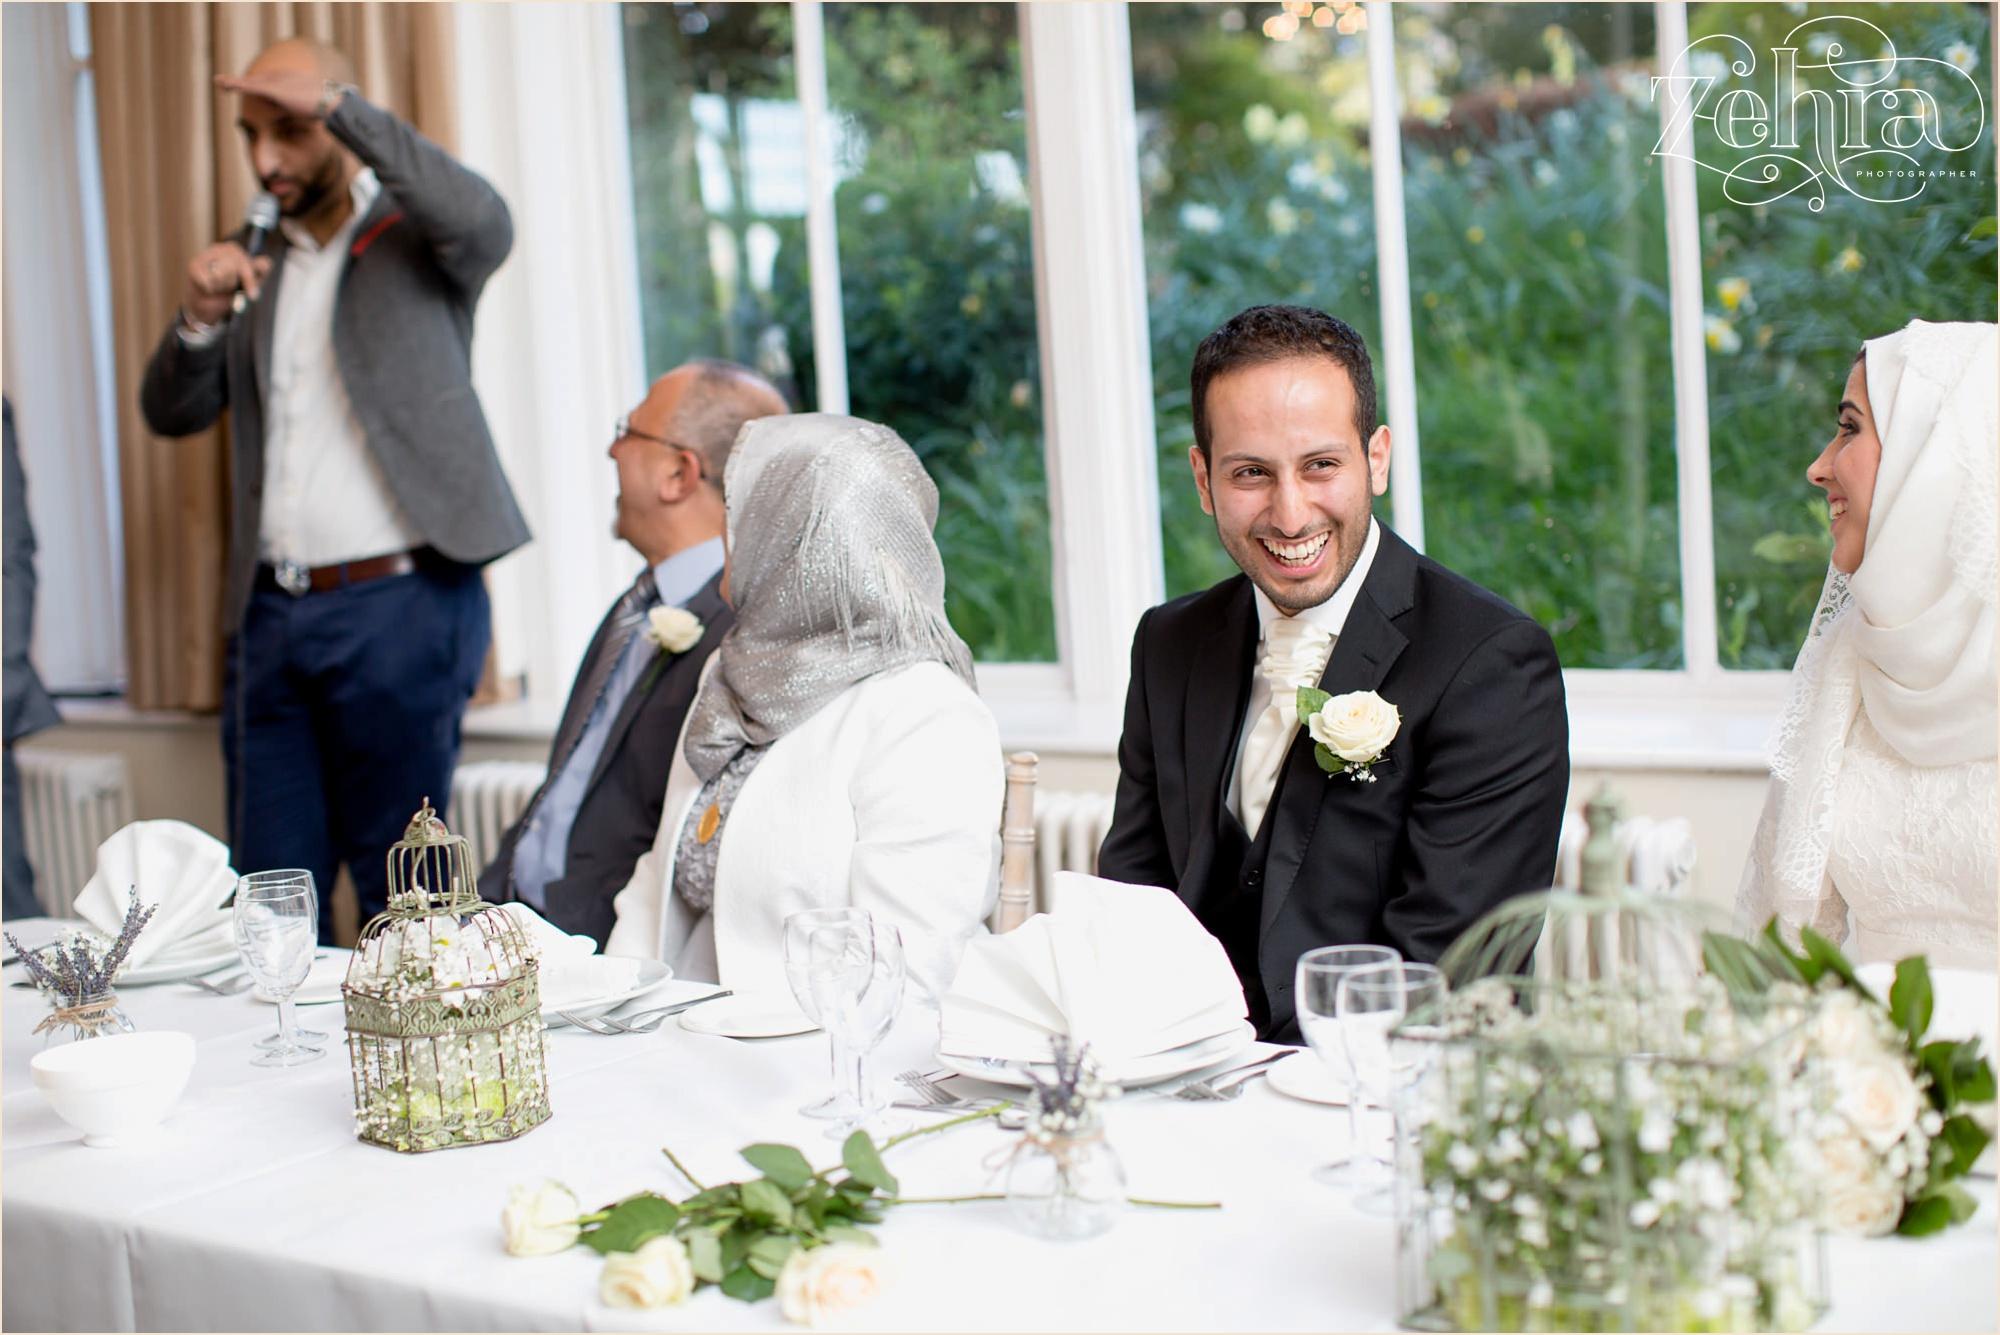 jasira manchester wedding photographer_0108.jpg